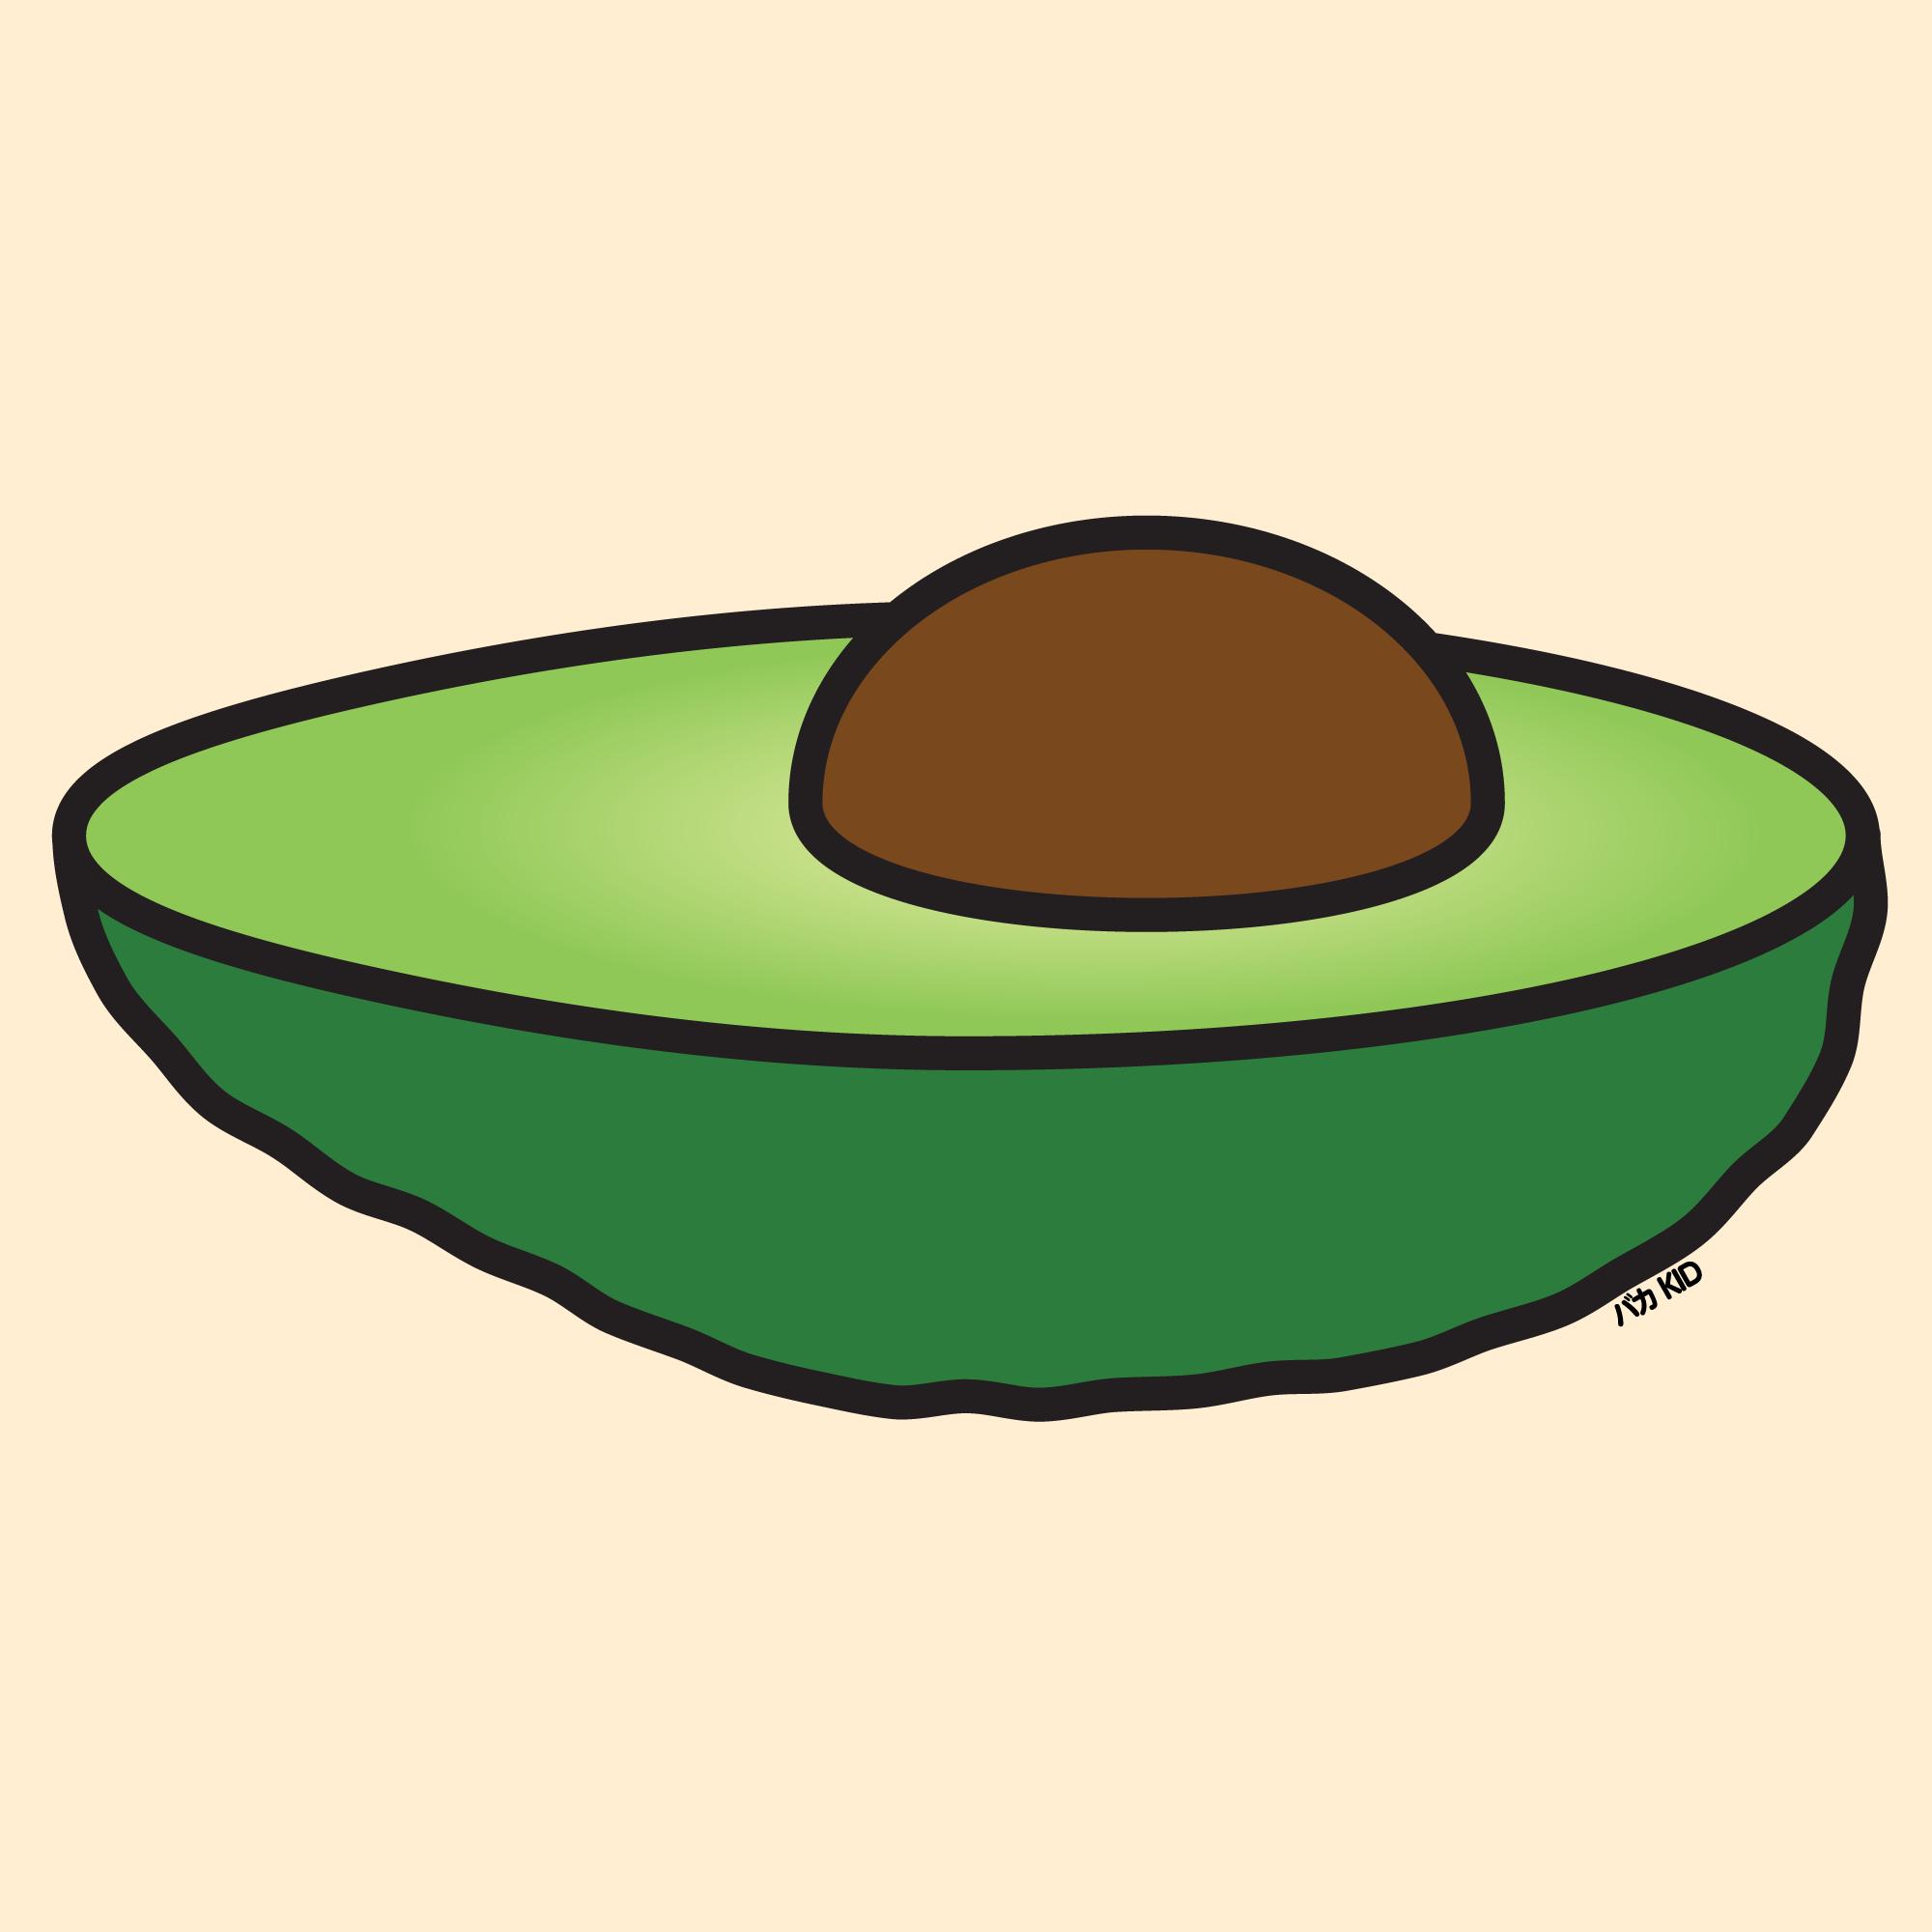 Avocado clipart kid.  stupidkid illustration